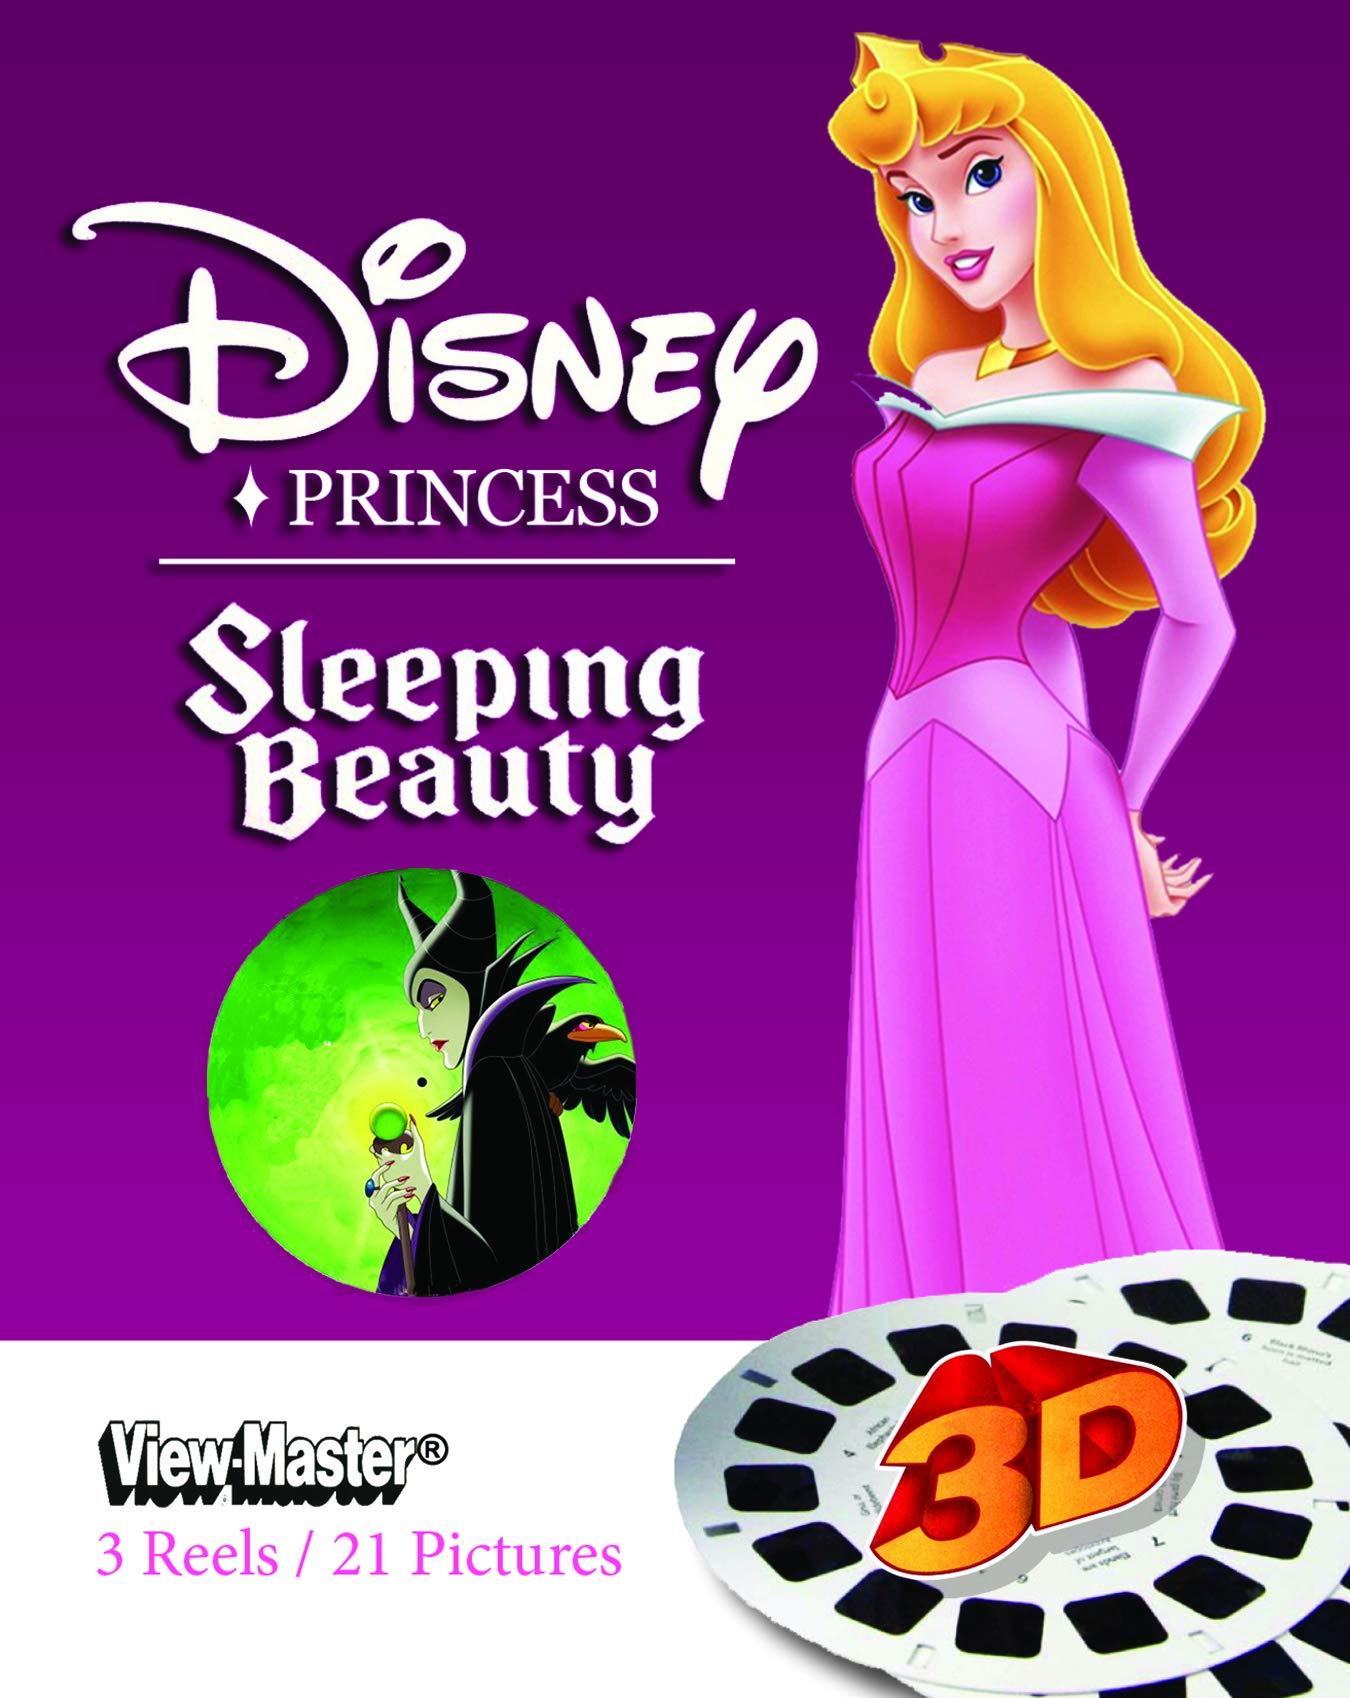 View-Master Classic 3Reel Set Sleeping Beauty